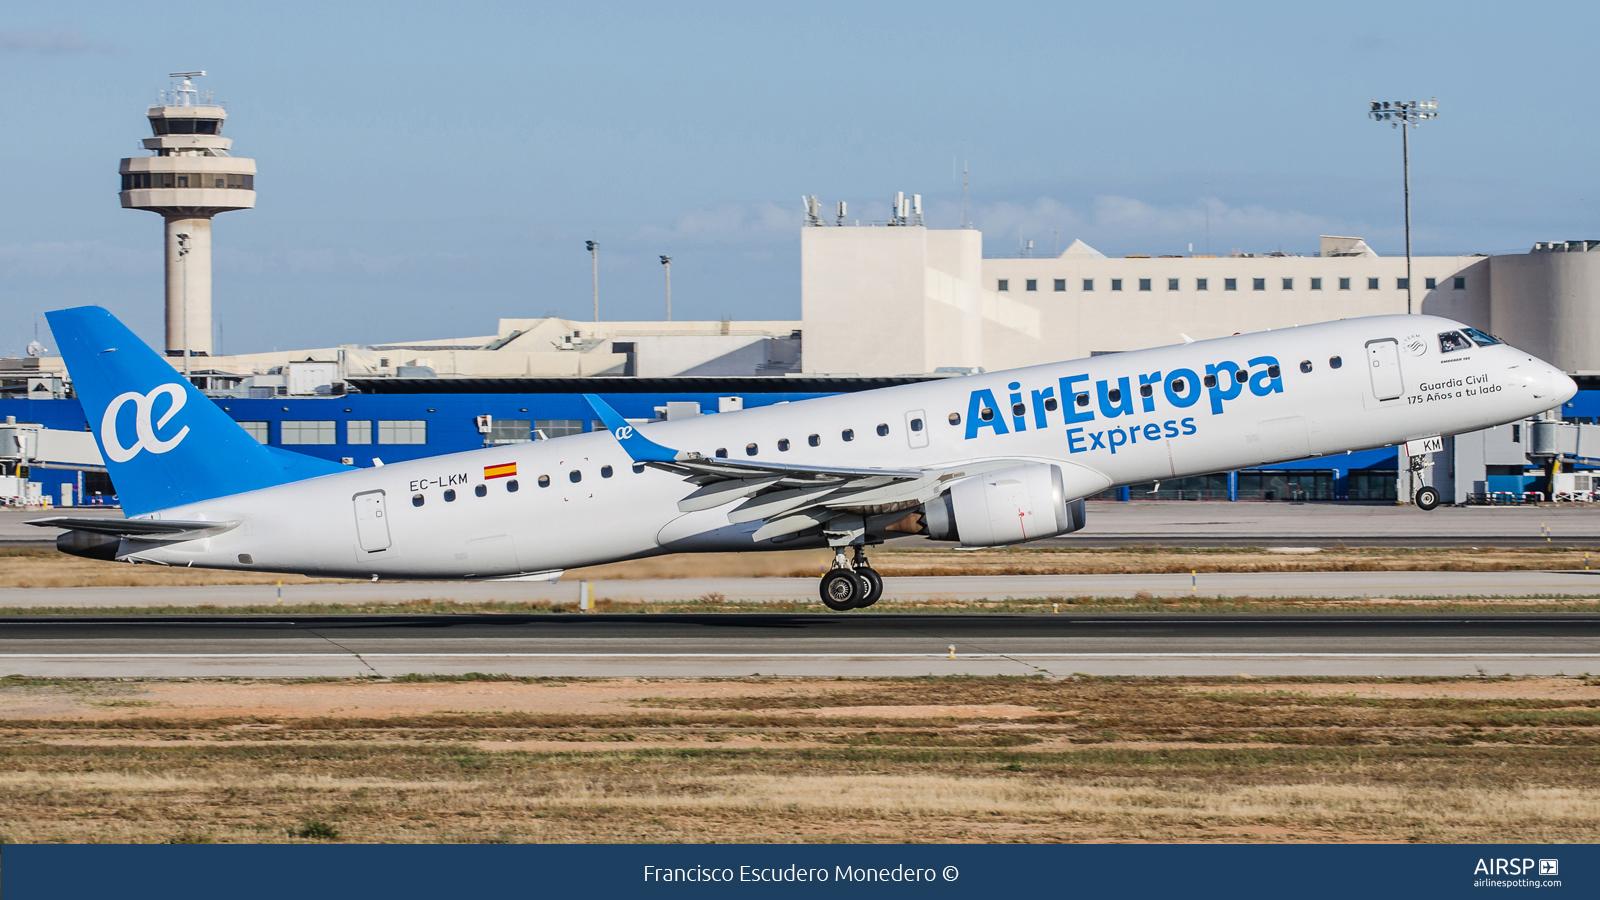 Air Europa Express  Embraer ERJ-195  EC-LKM